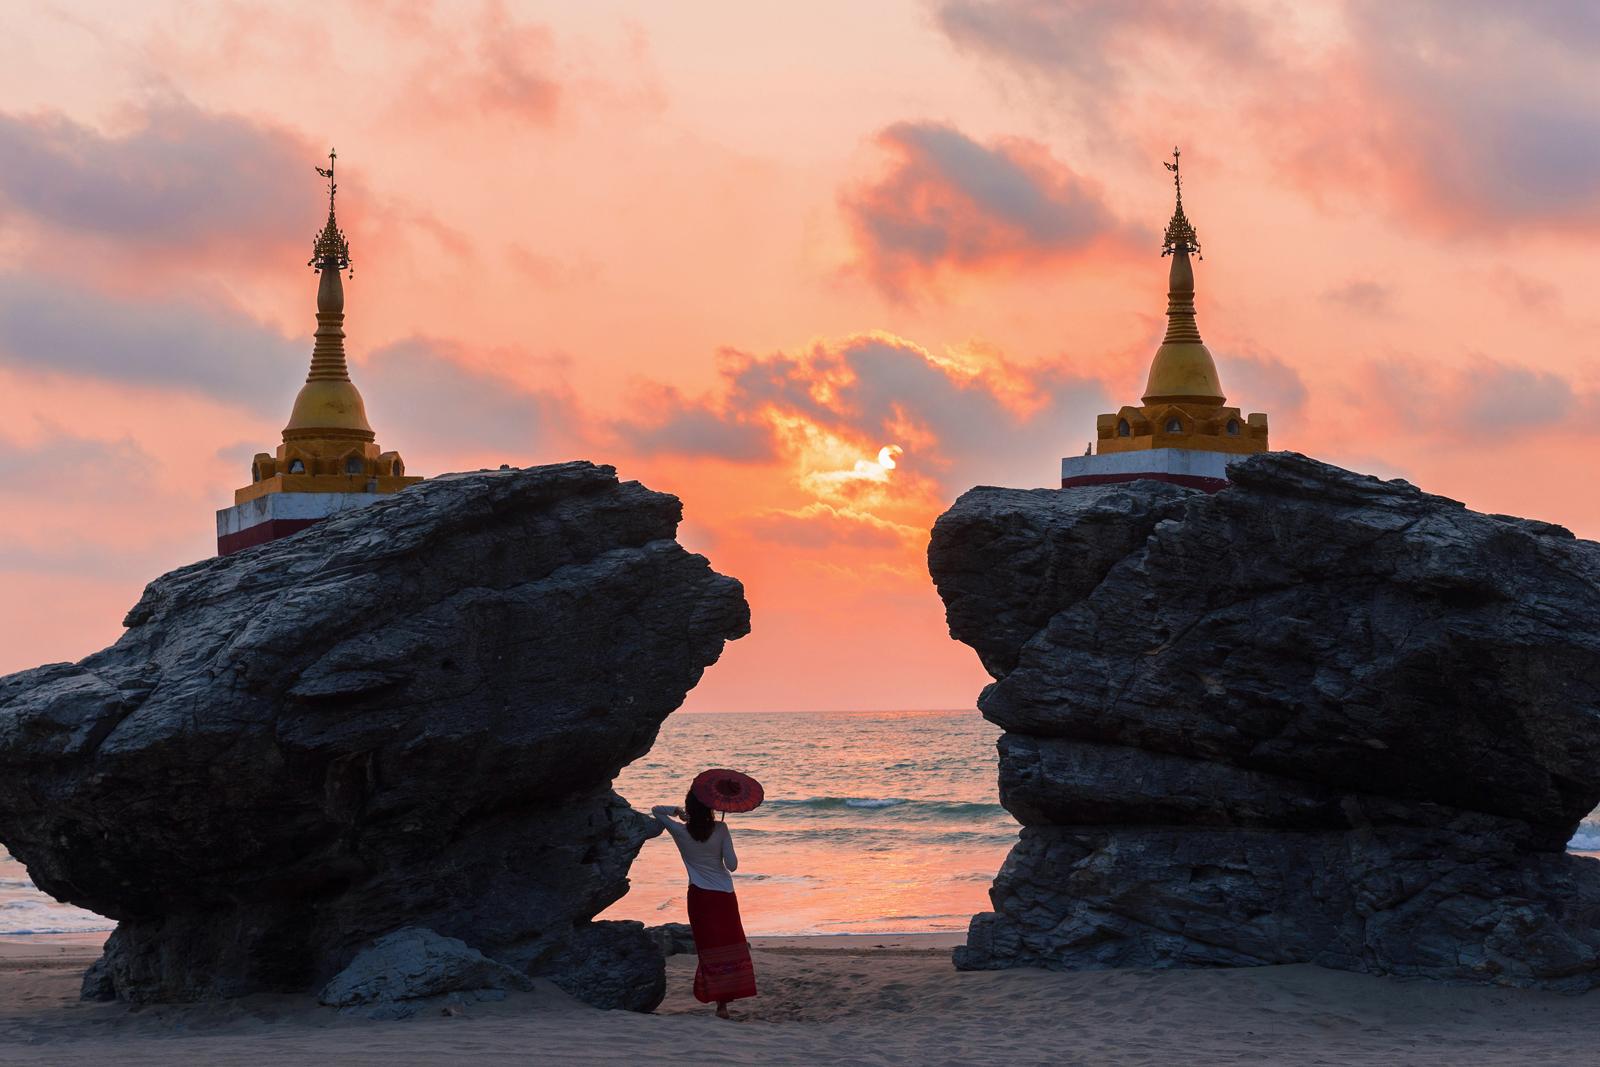 ngwe-saung-beach-myanmar-car-rental-5.jpg